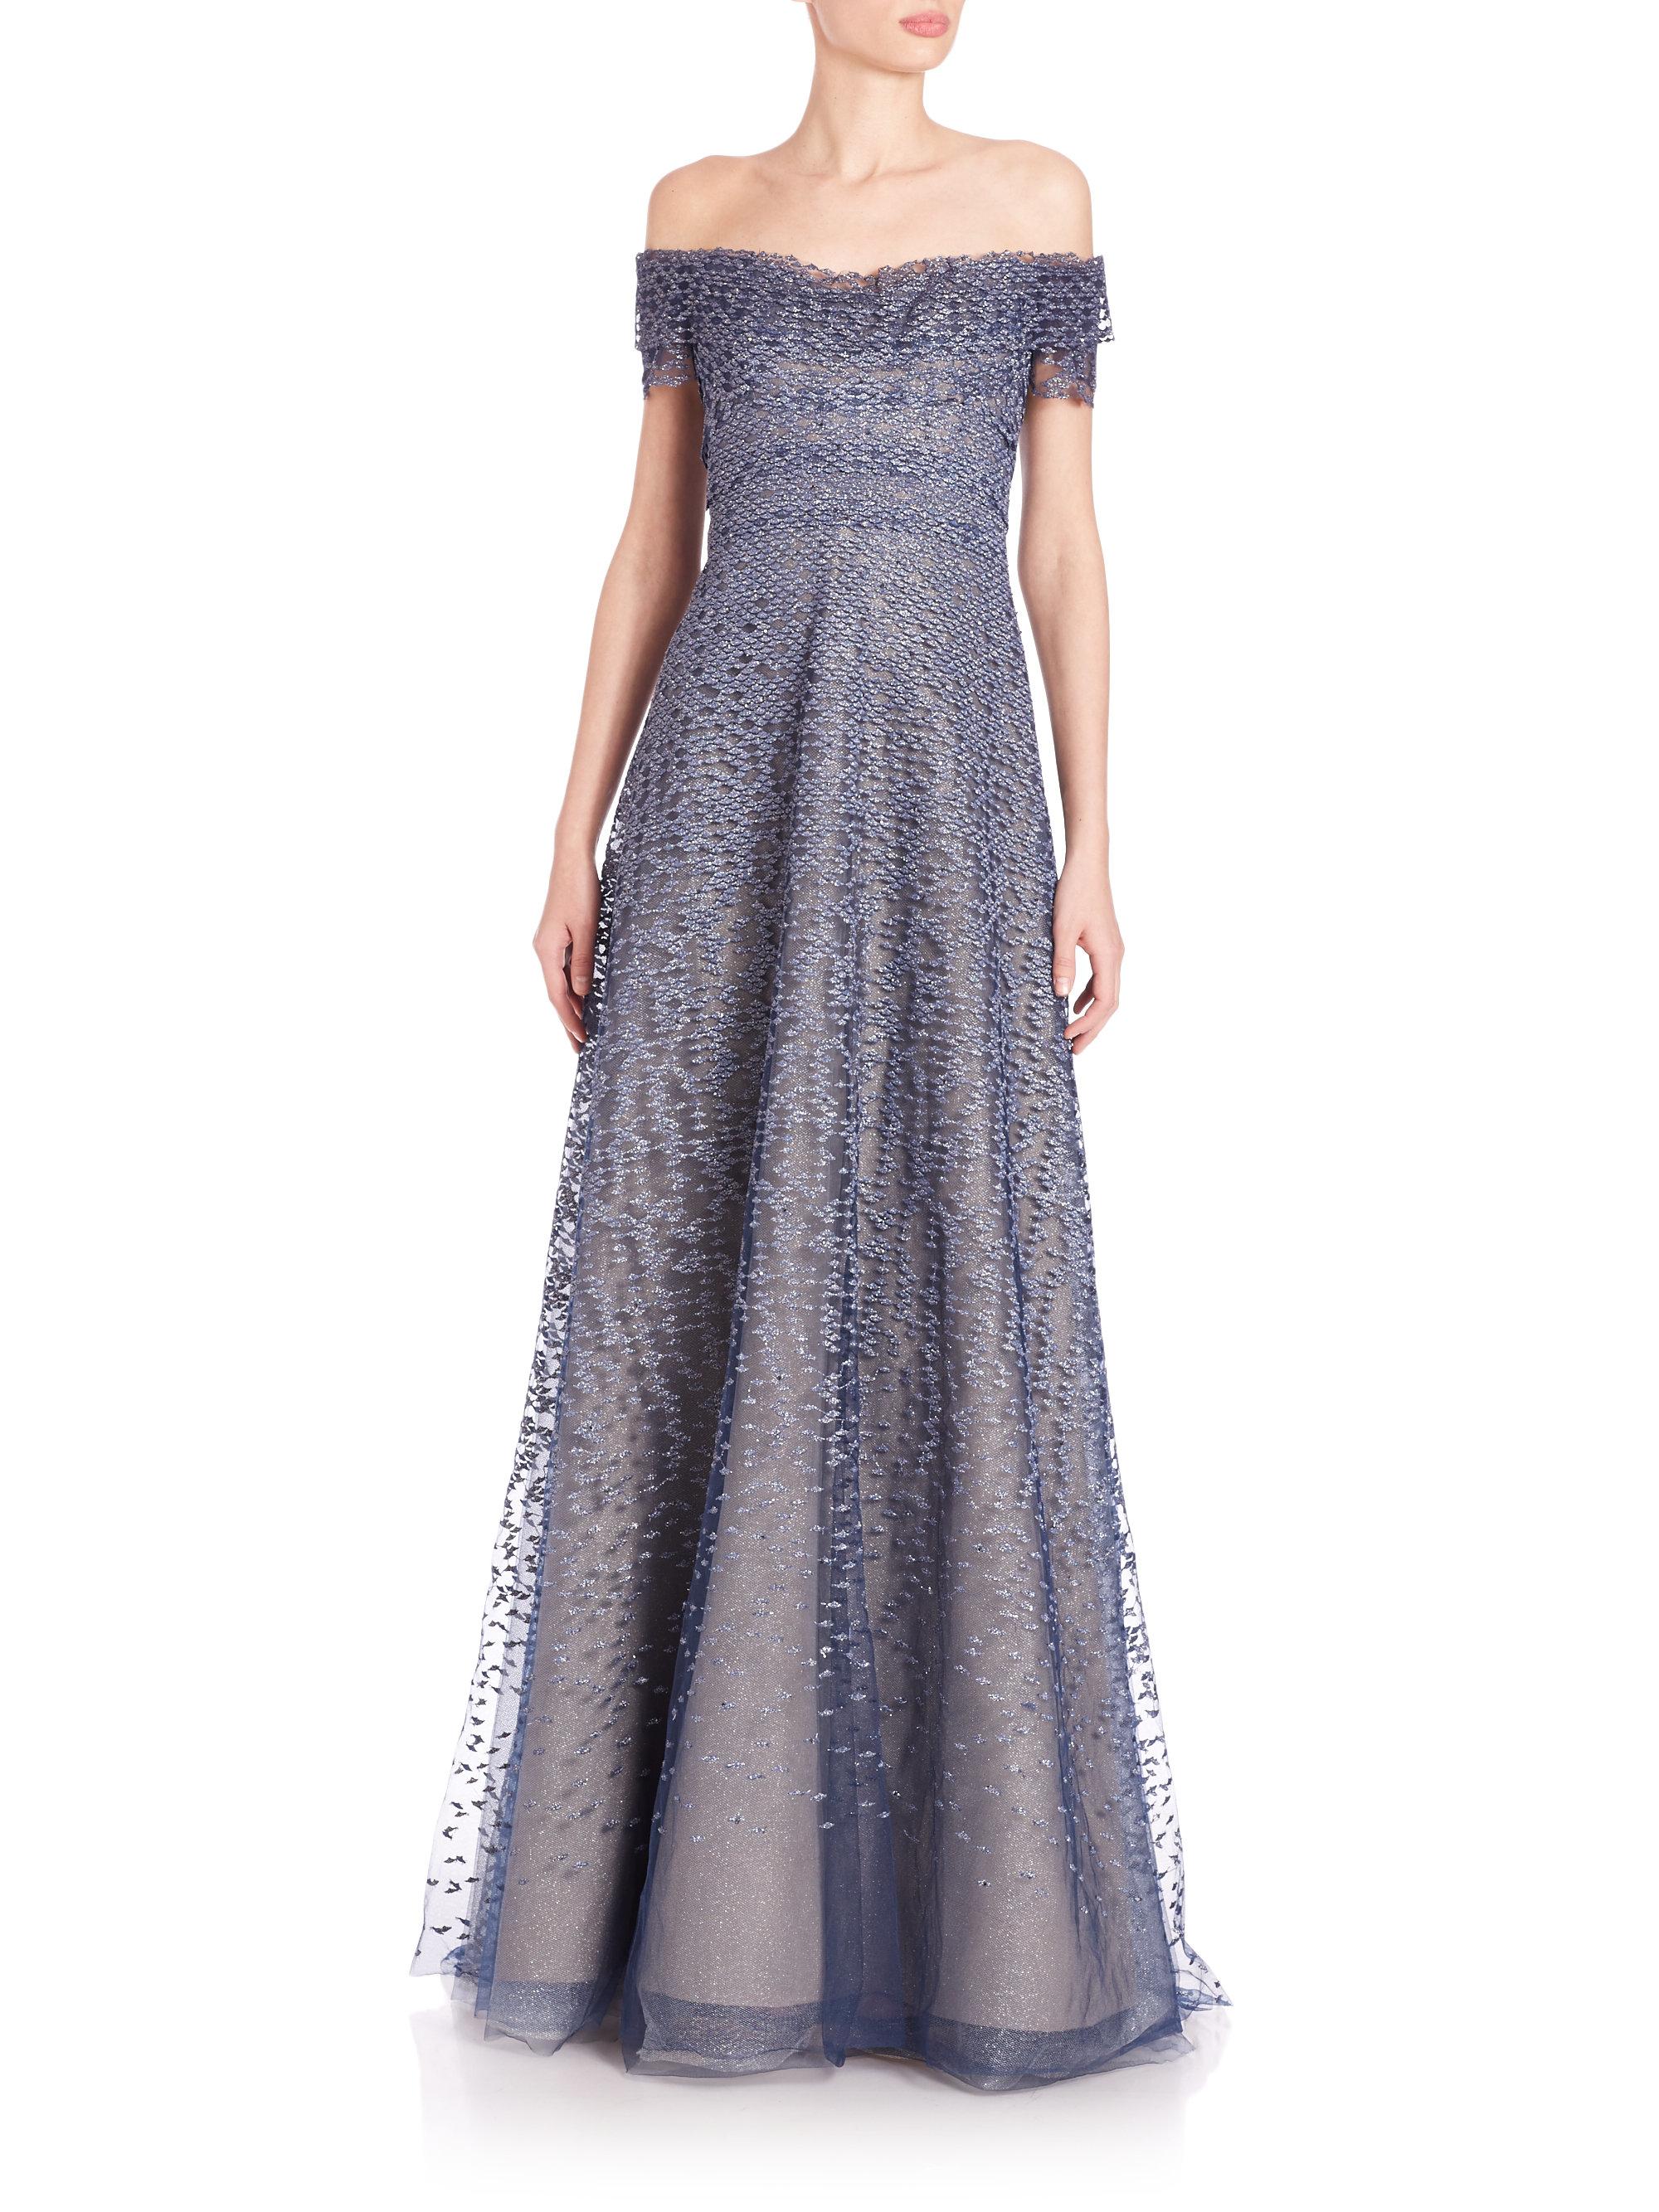 Lace Evening Gown Carolina Herrera